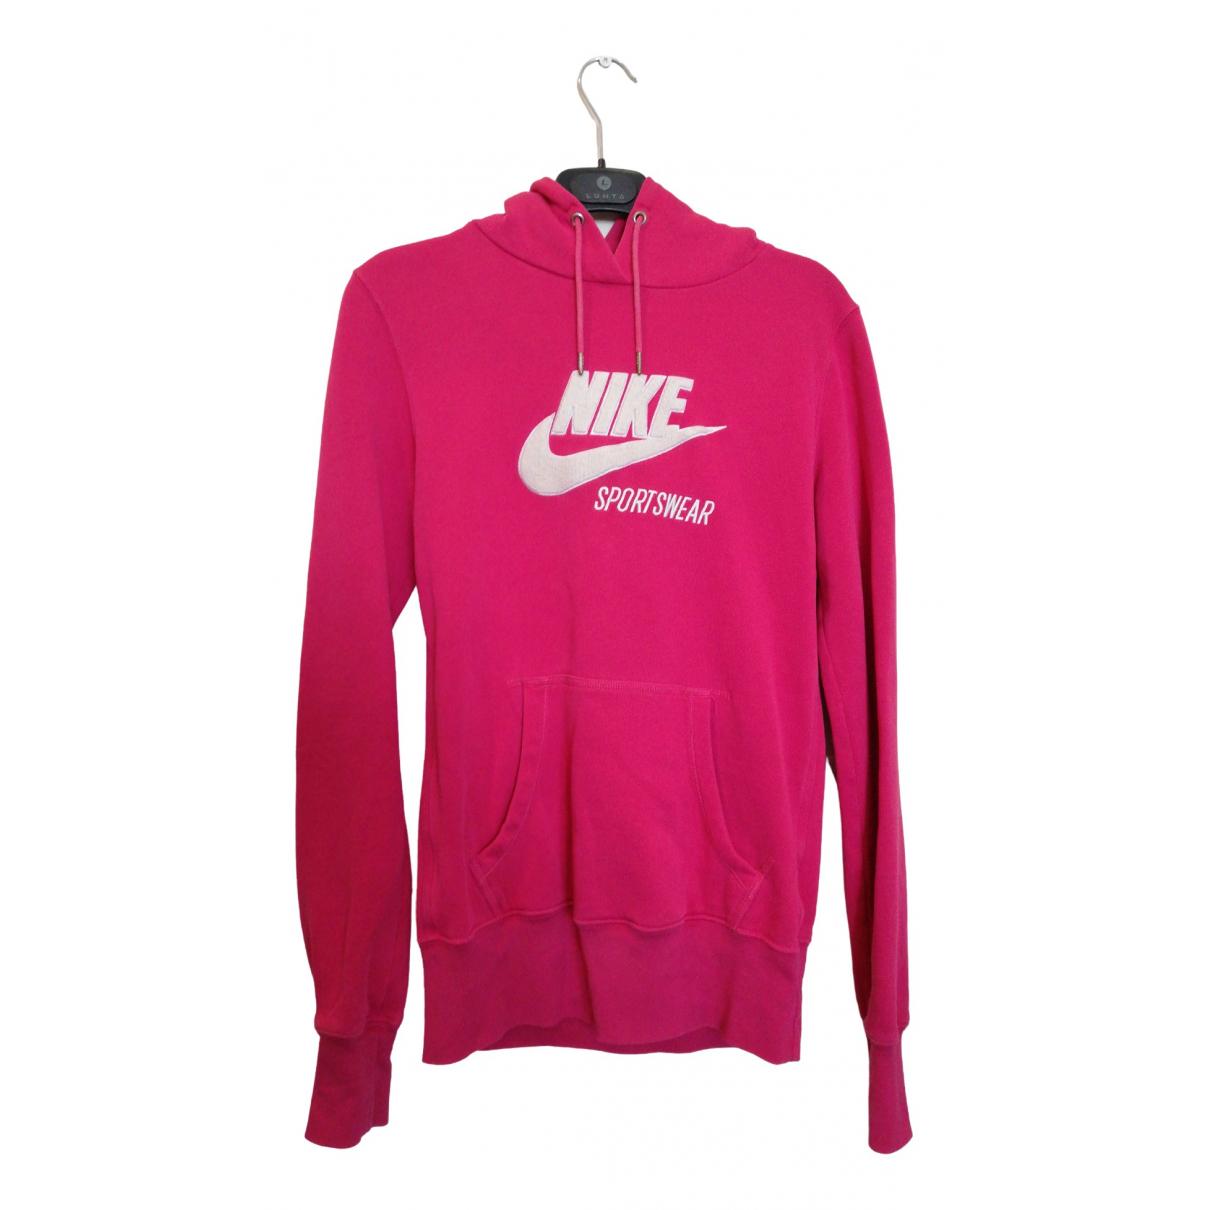 Nike \N Pink Cotton  top for Women S International